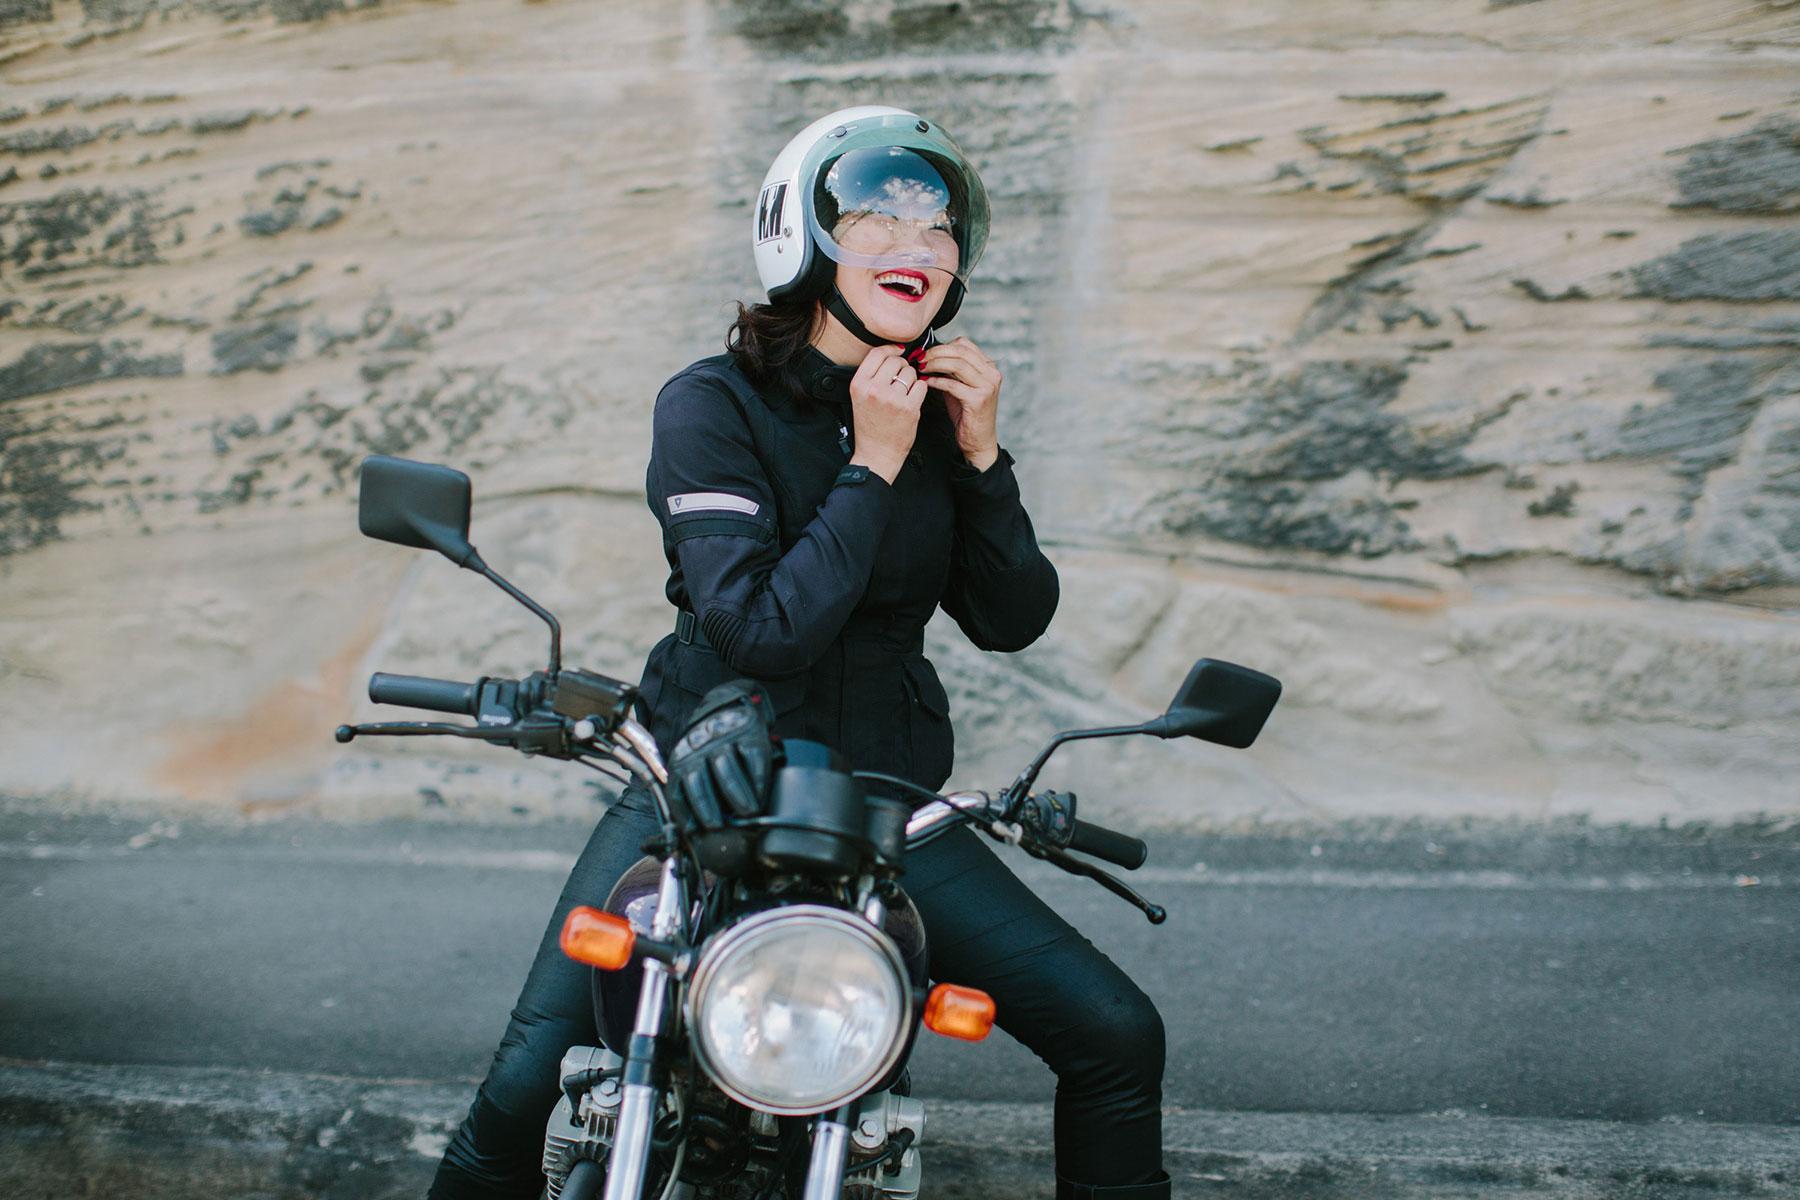 Zaya and her Honda 550cc whatever...